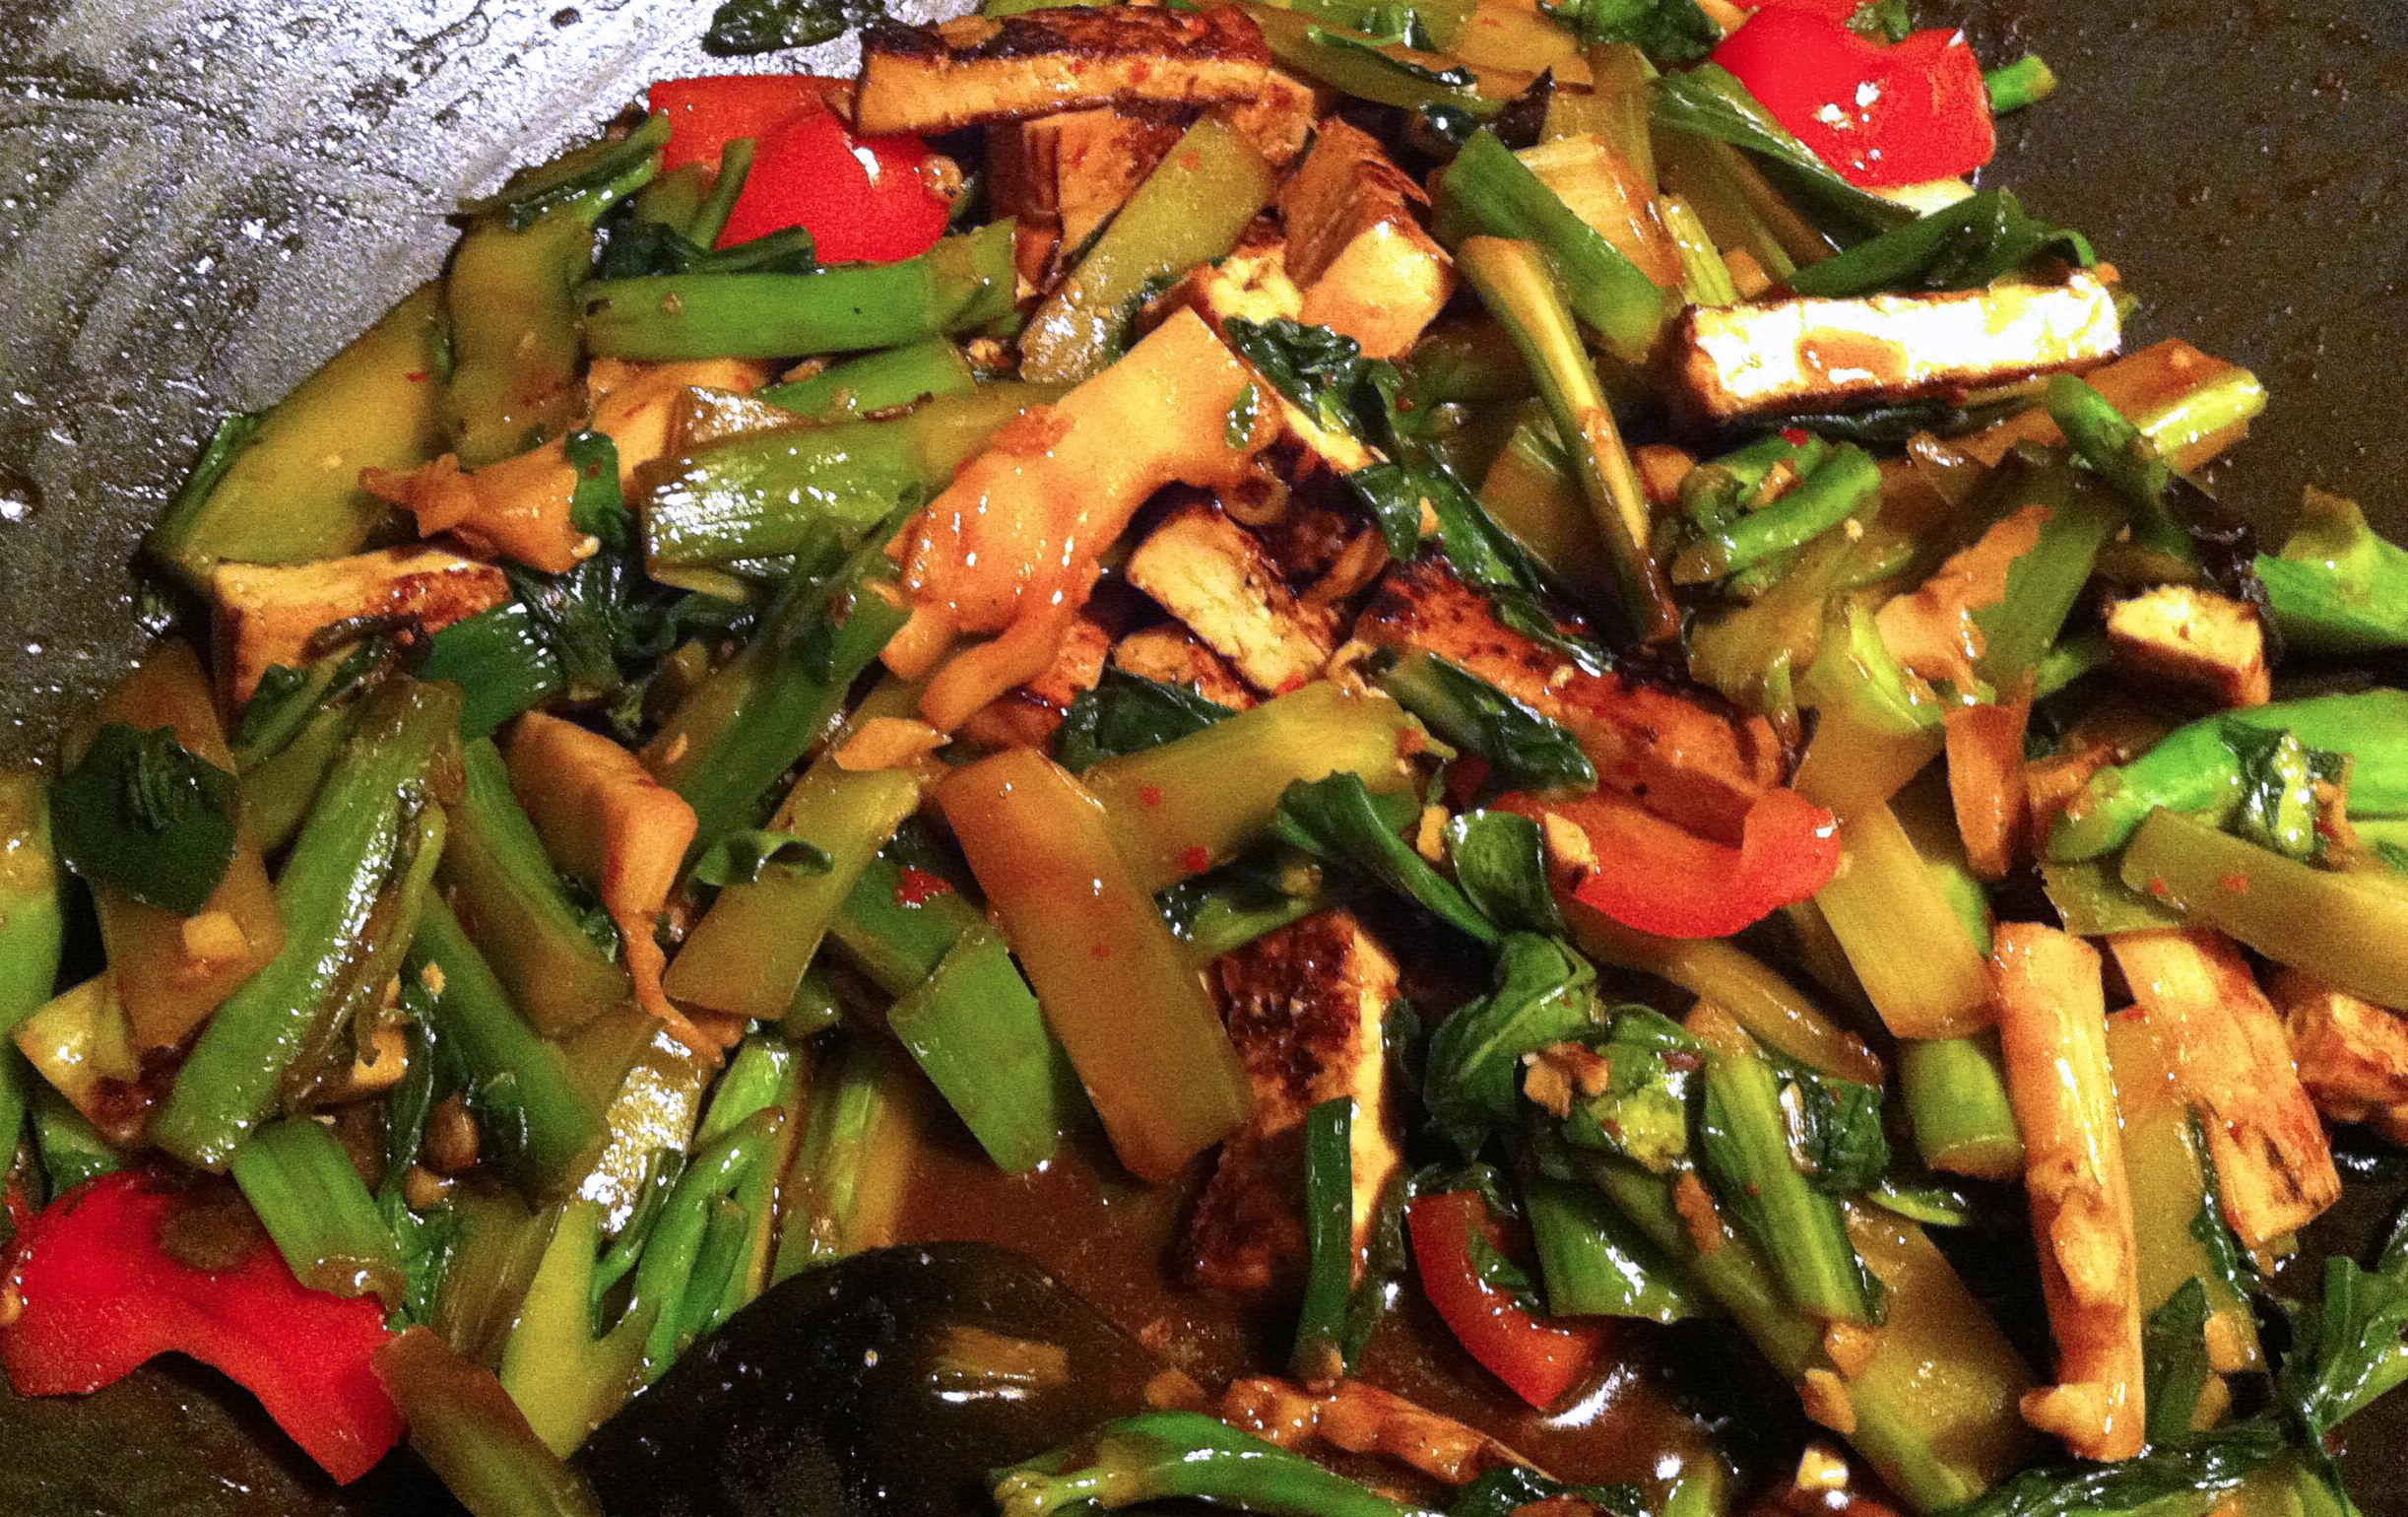 Karl's Tofu and Chinese Broccoli Stir-fry | Jabberwocky Stew